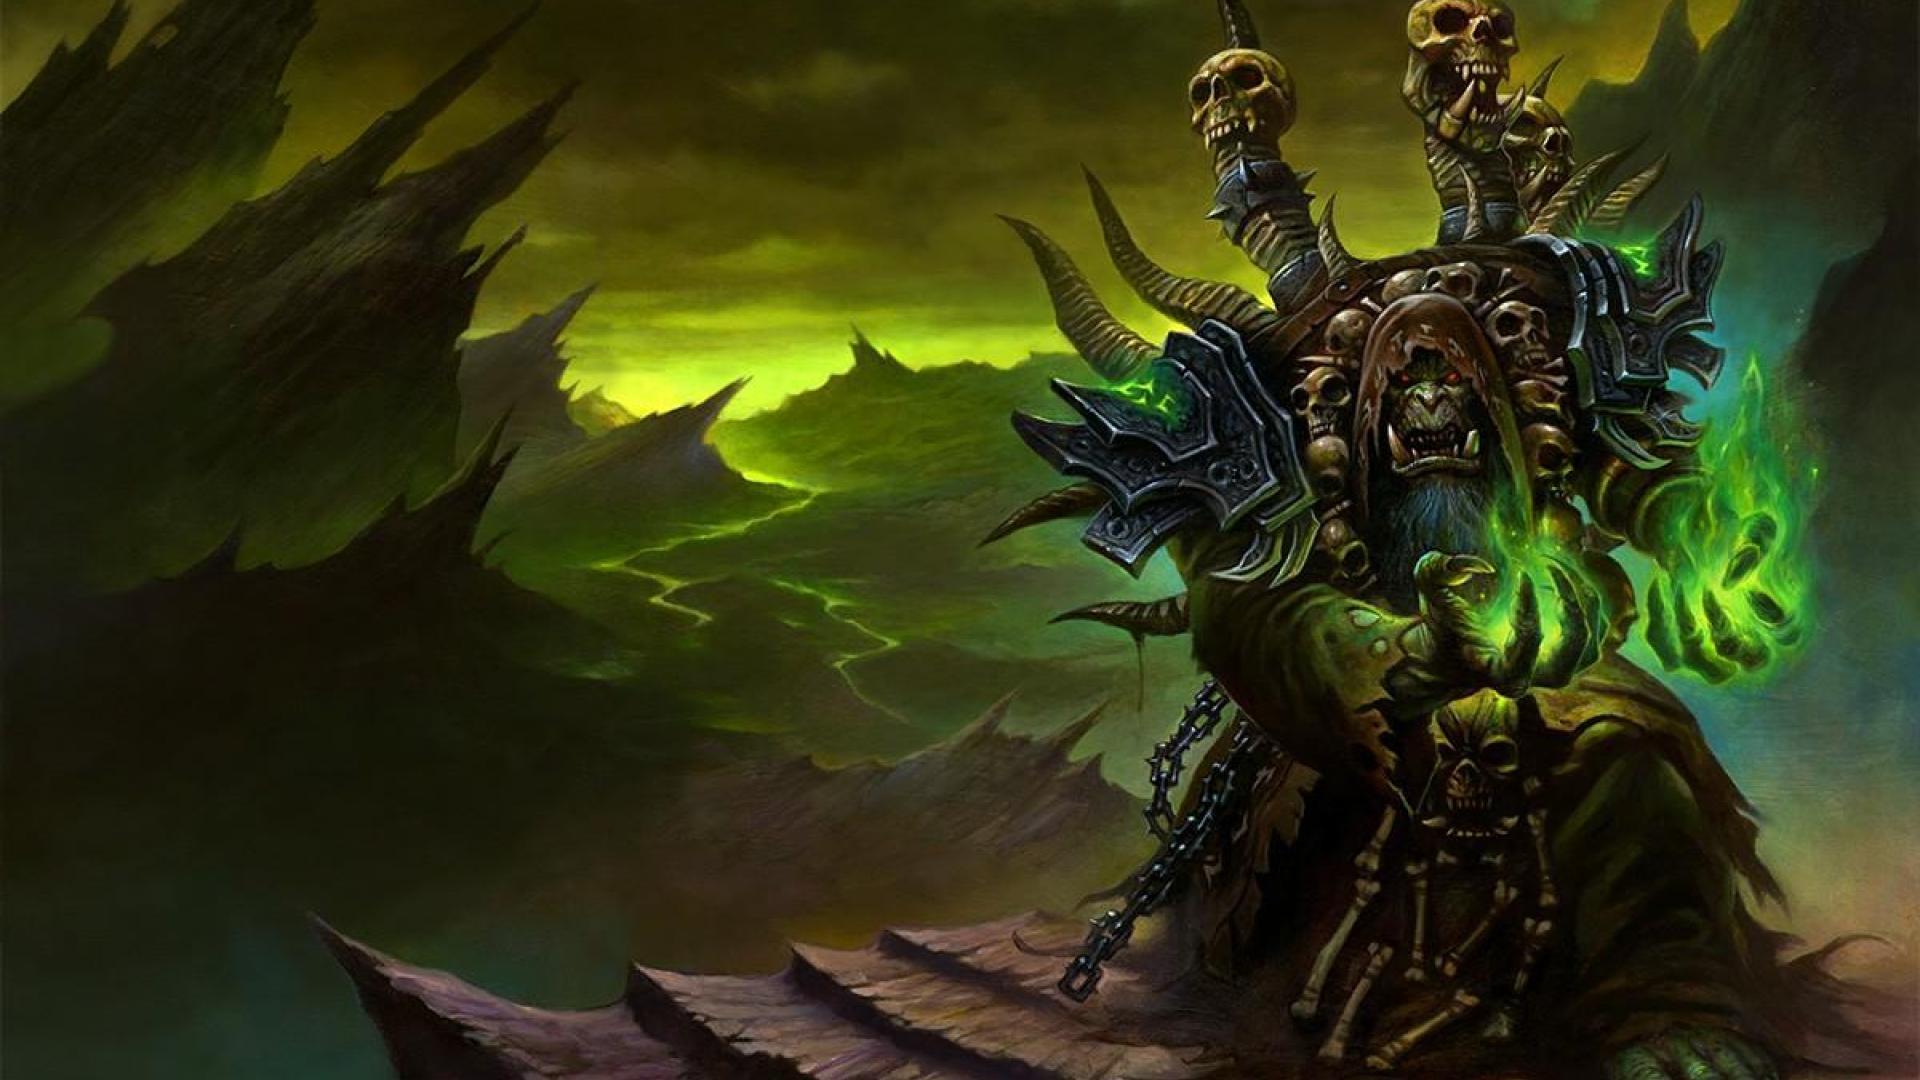 World Of Warcraft Wallpaper 1920x1080